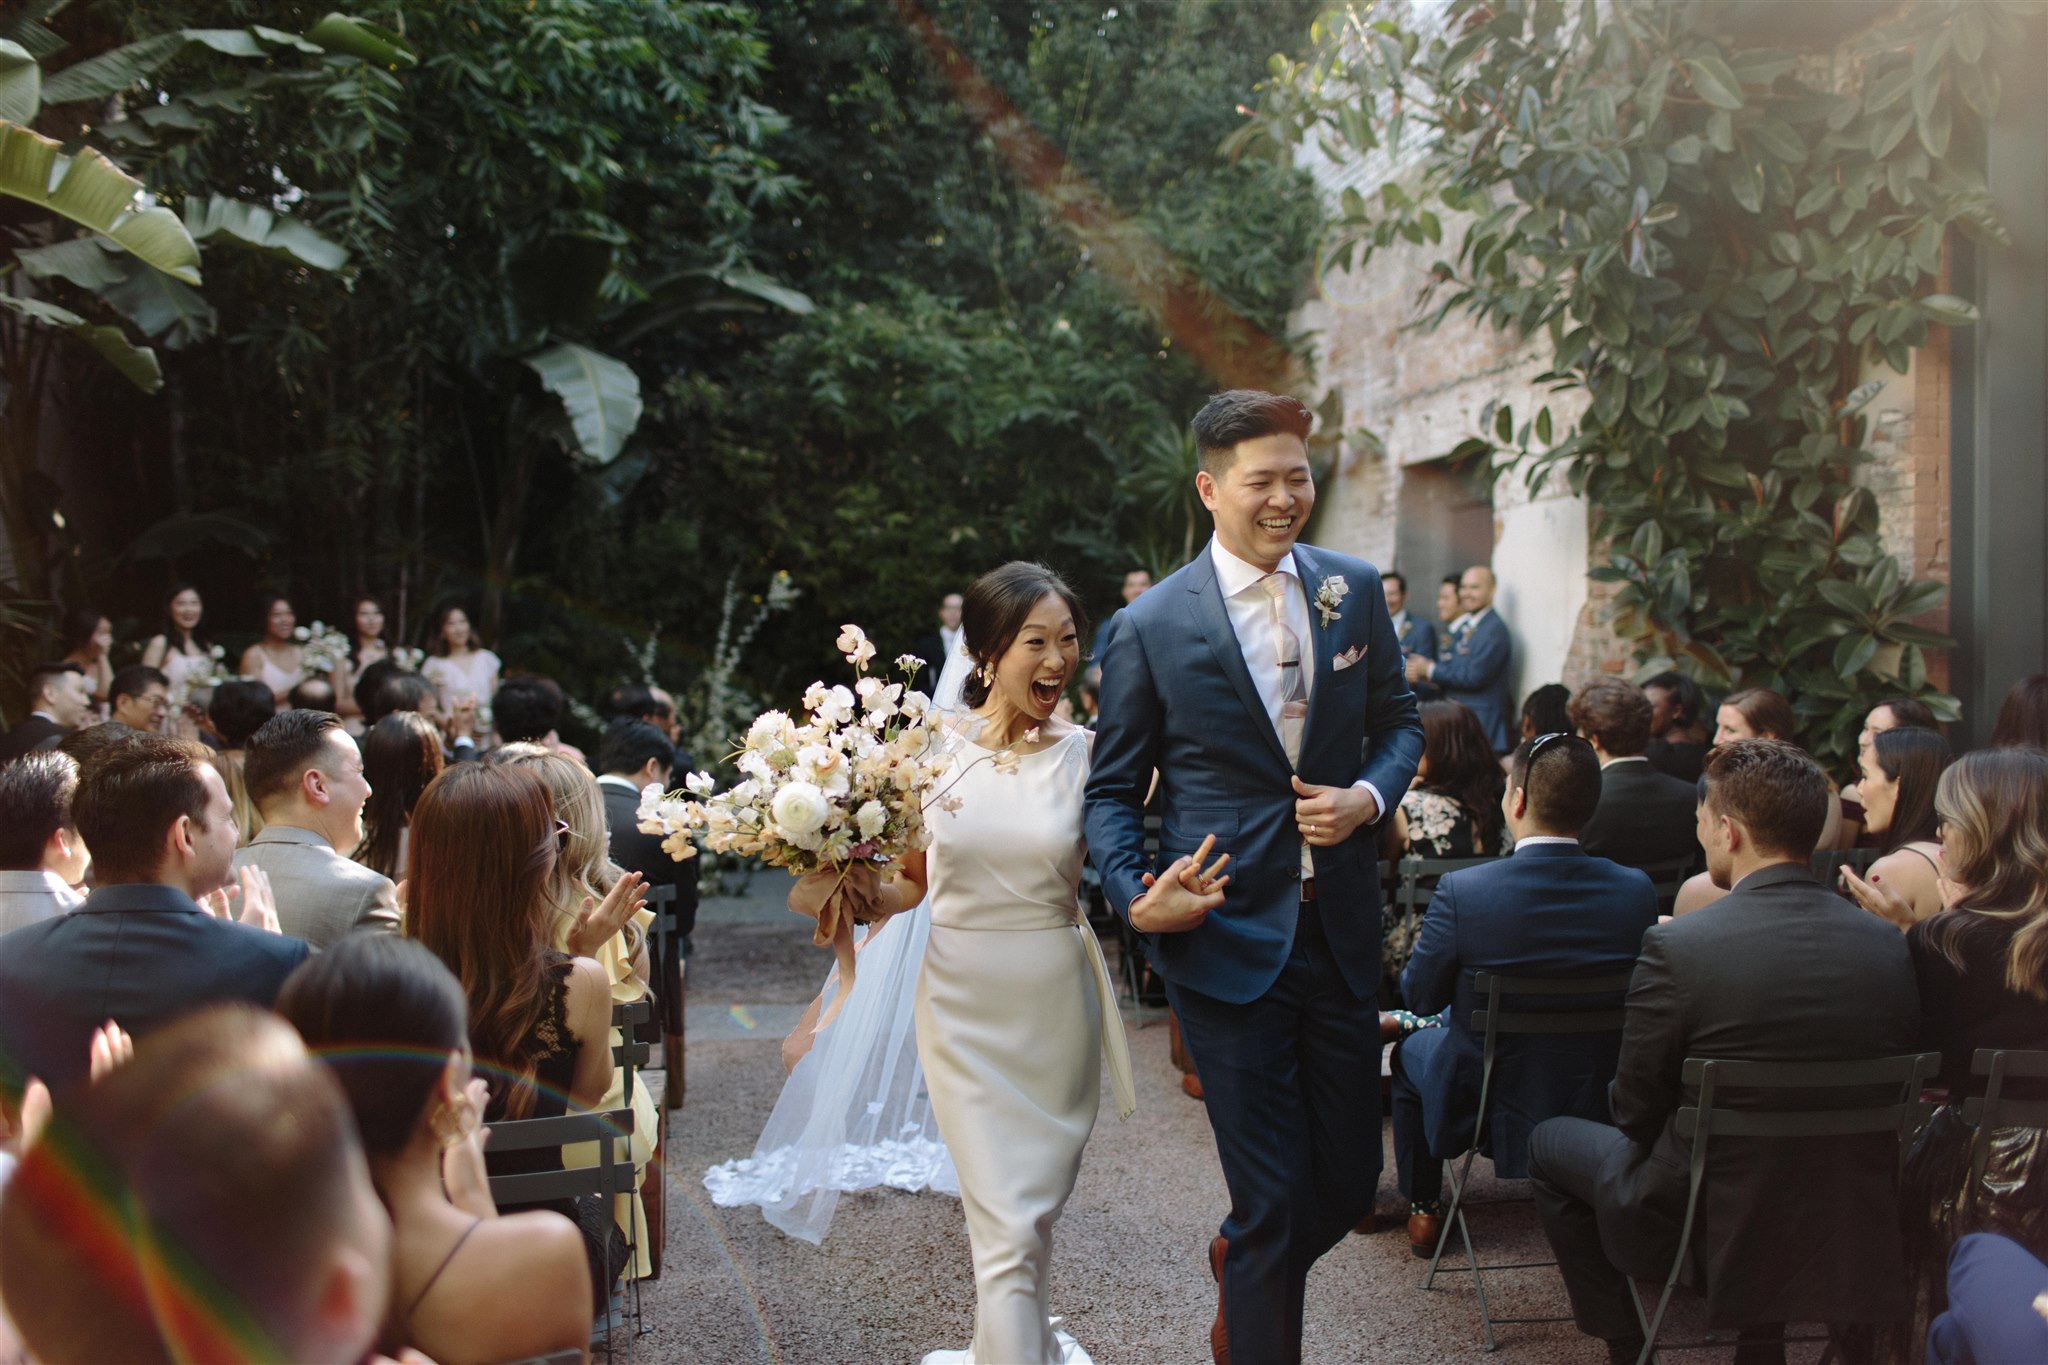 Millwick_Wedding_Judyth_and_Mike-prints-650.jpg